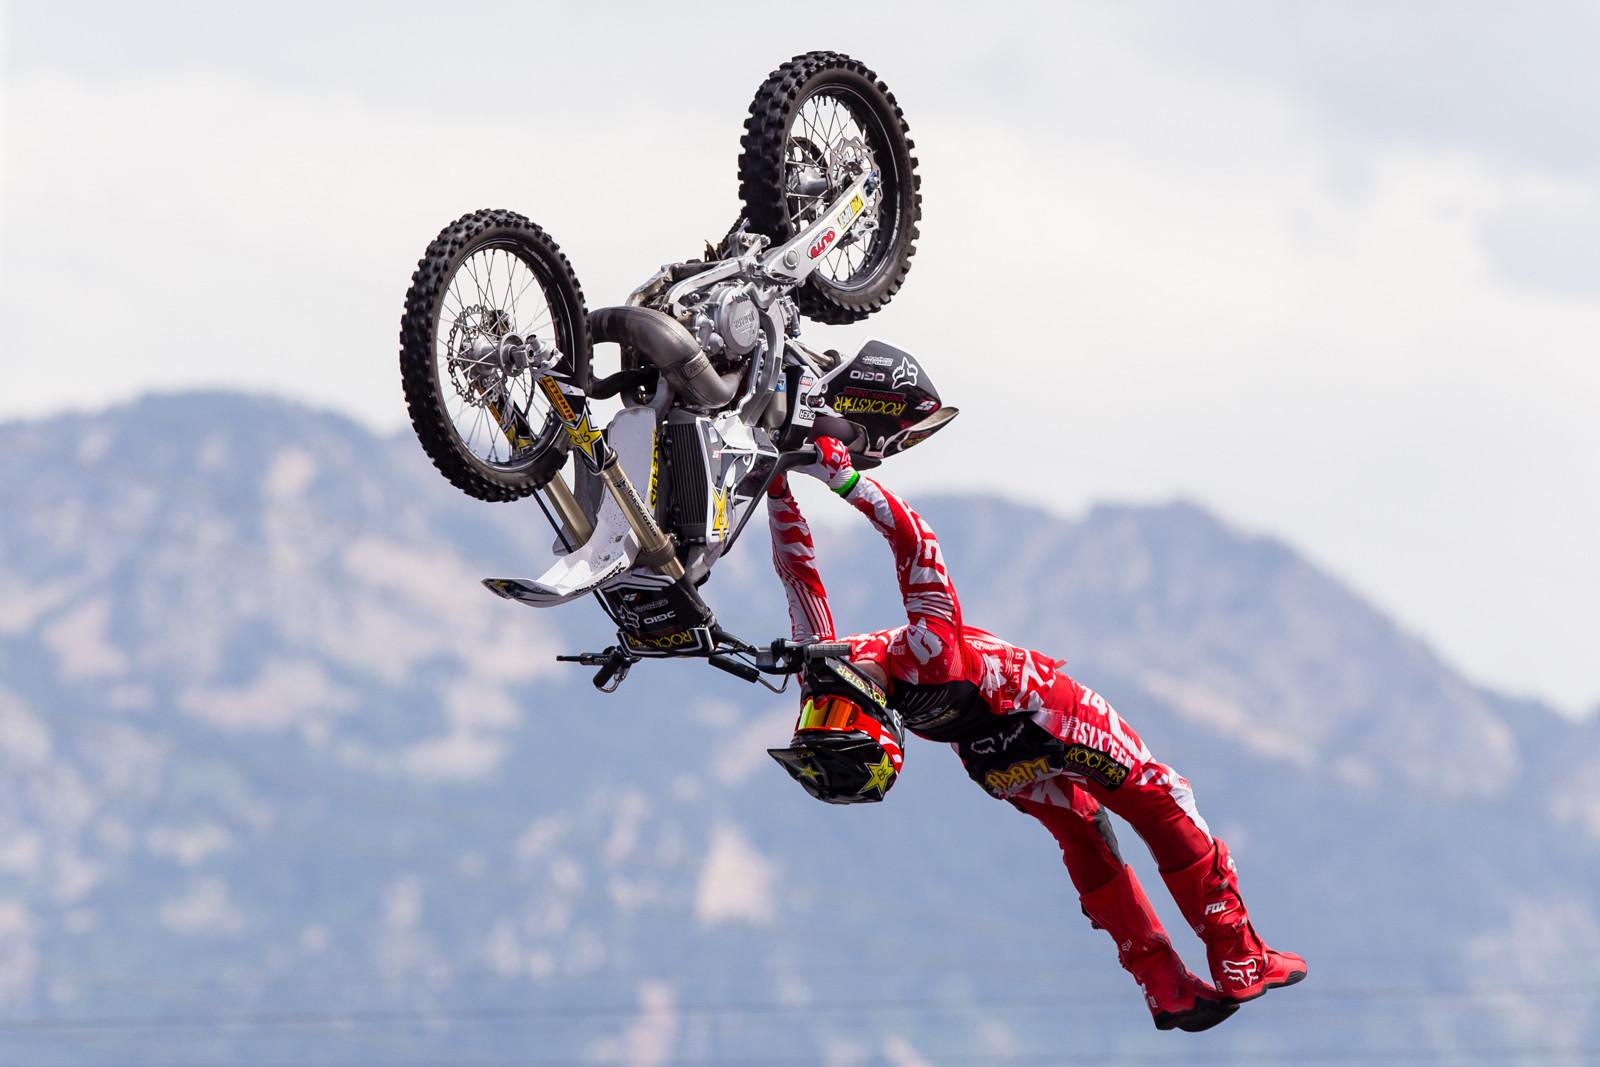 Adam Jones - 2016 Nitro World Games: FMX Qualifying Gallery - Motocross Pictures - Vital MX